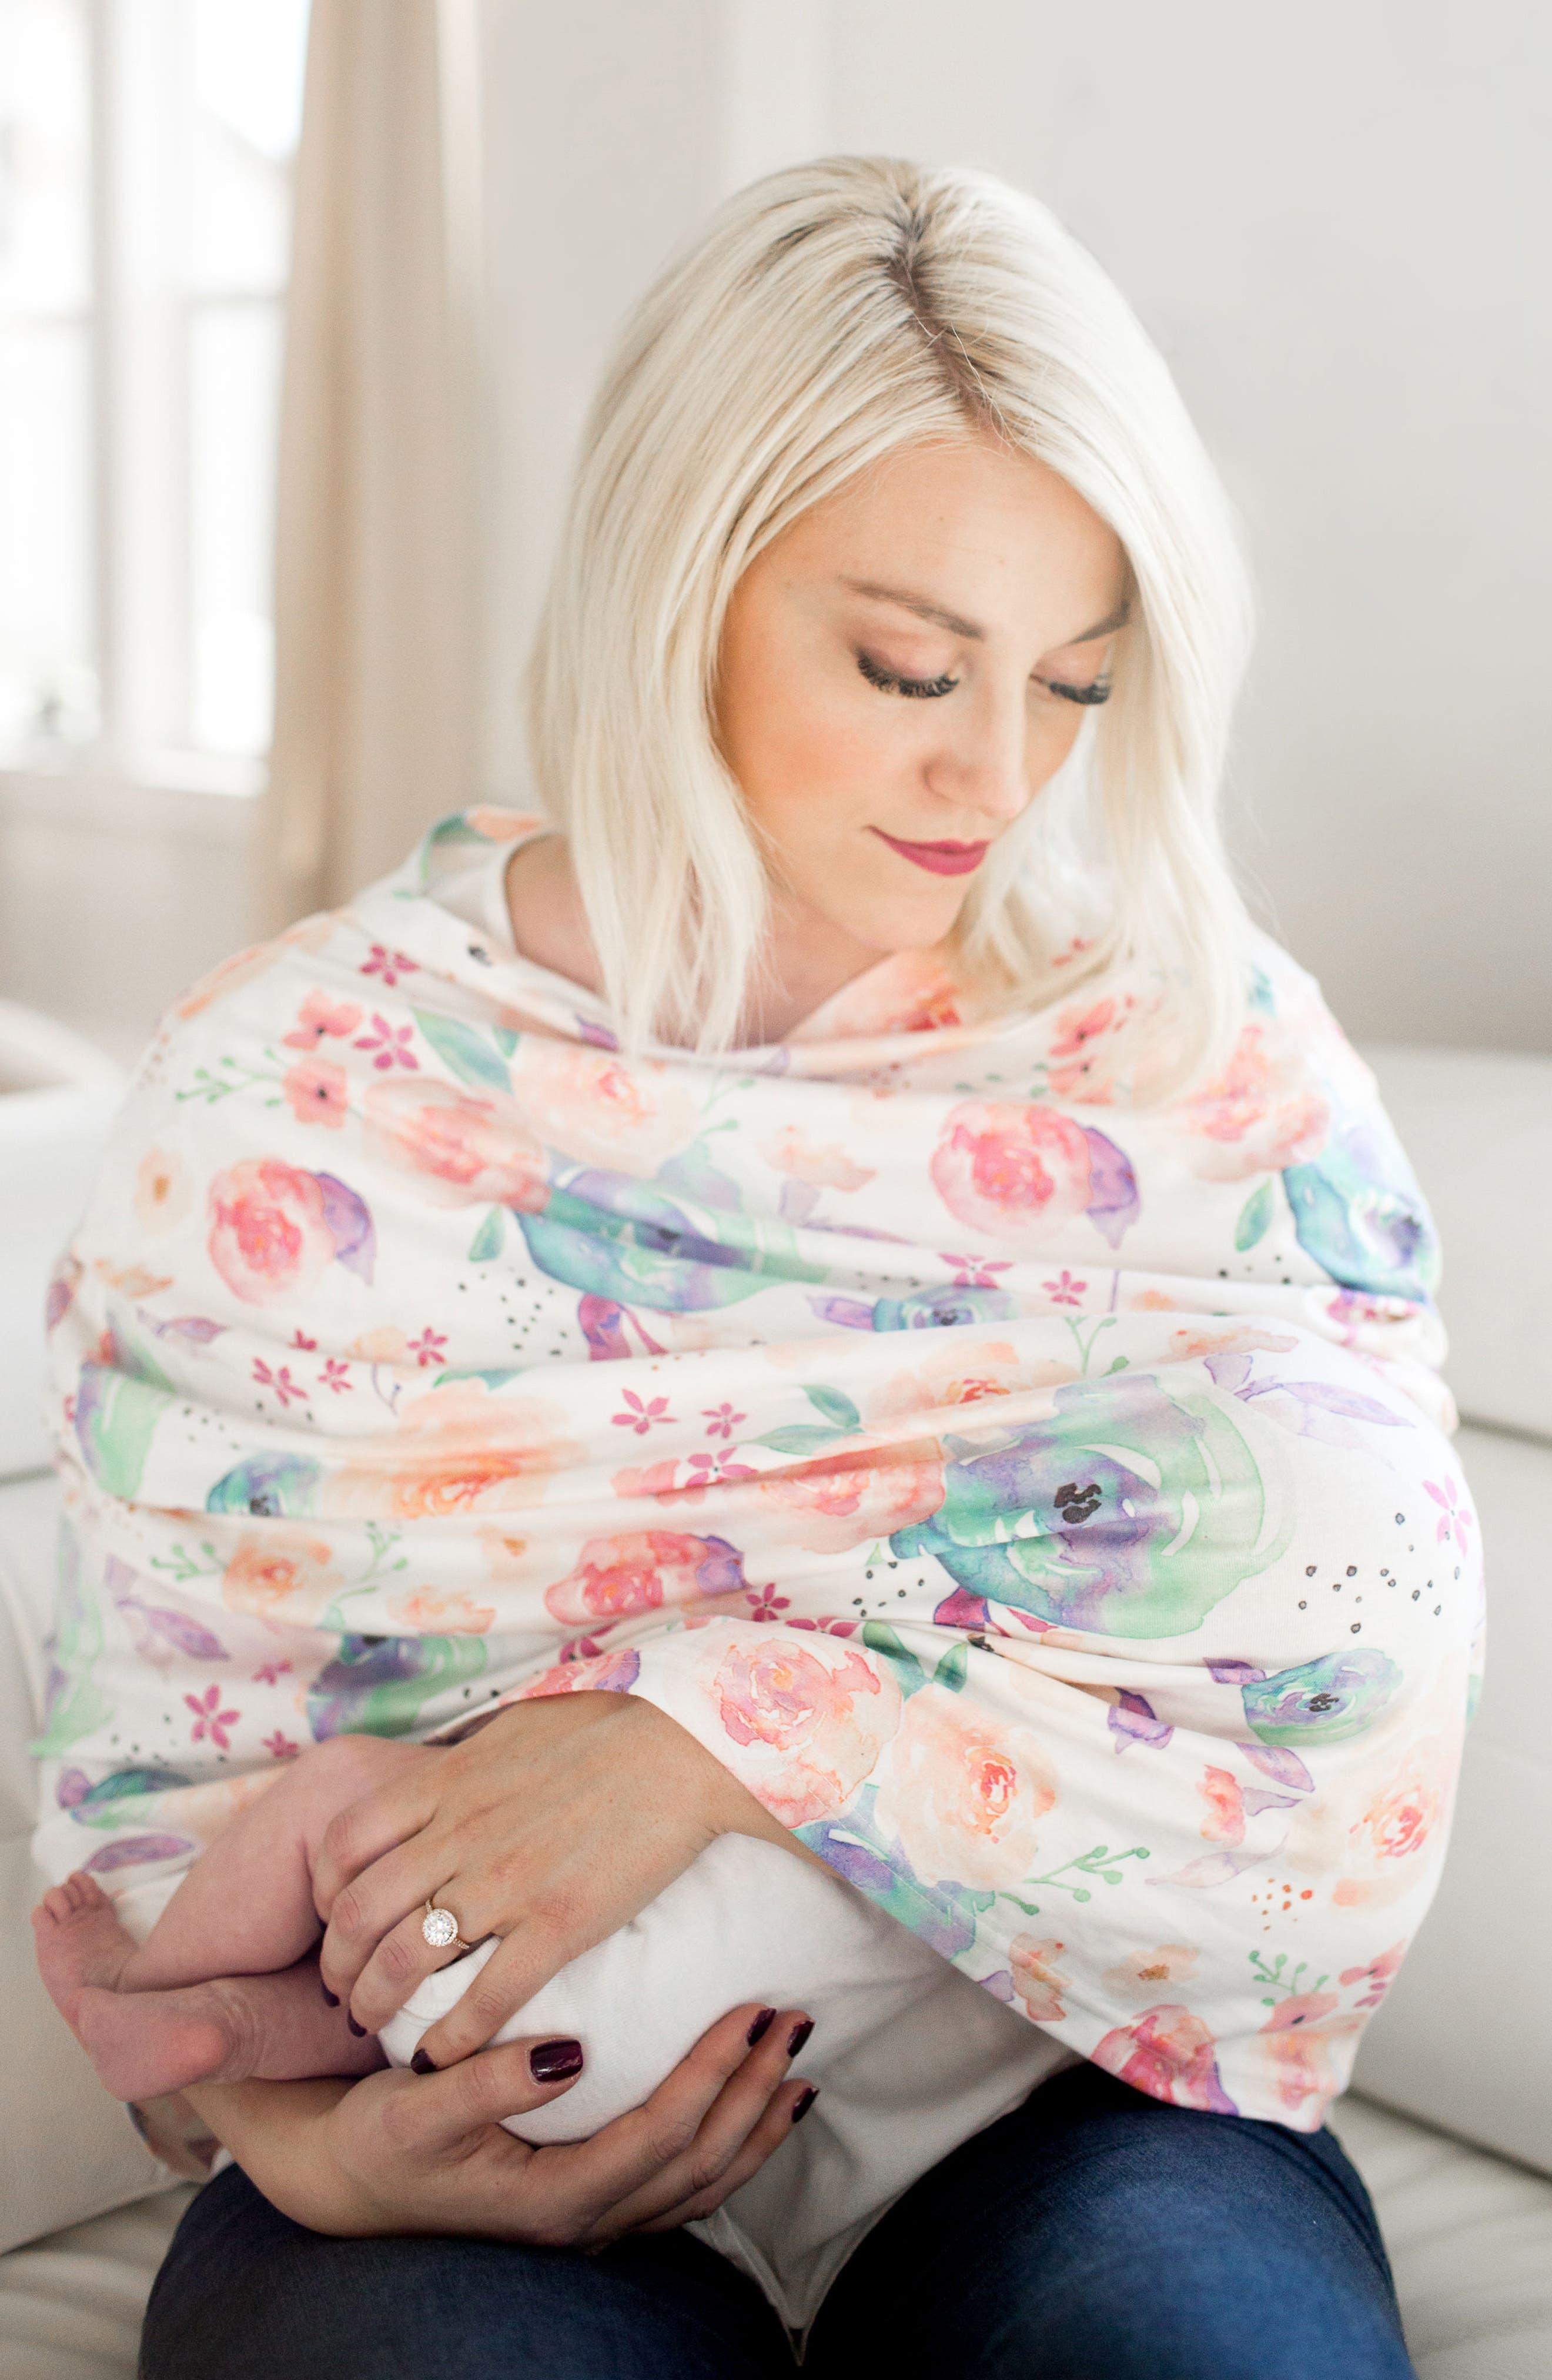 Bloom Multiuse Cover & Swaddle Blanket Gift Set,                             Alternate thumbnail 16, color,                             Bloom